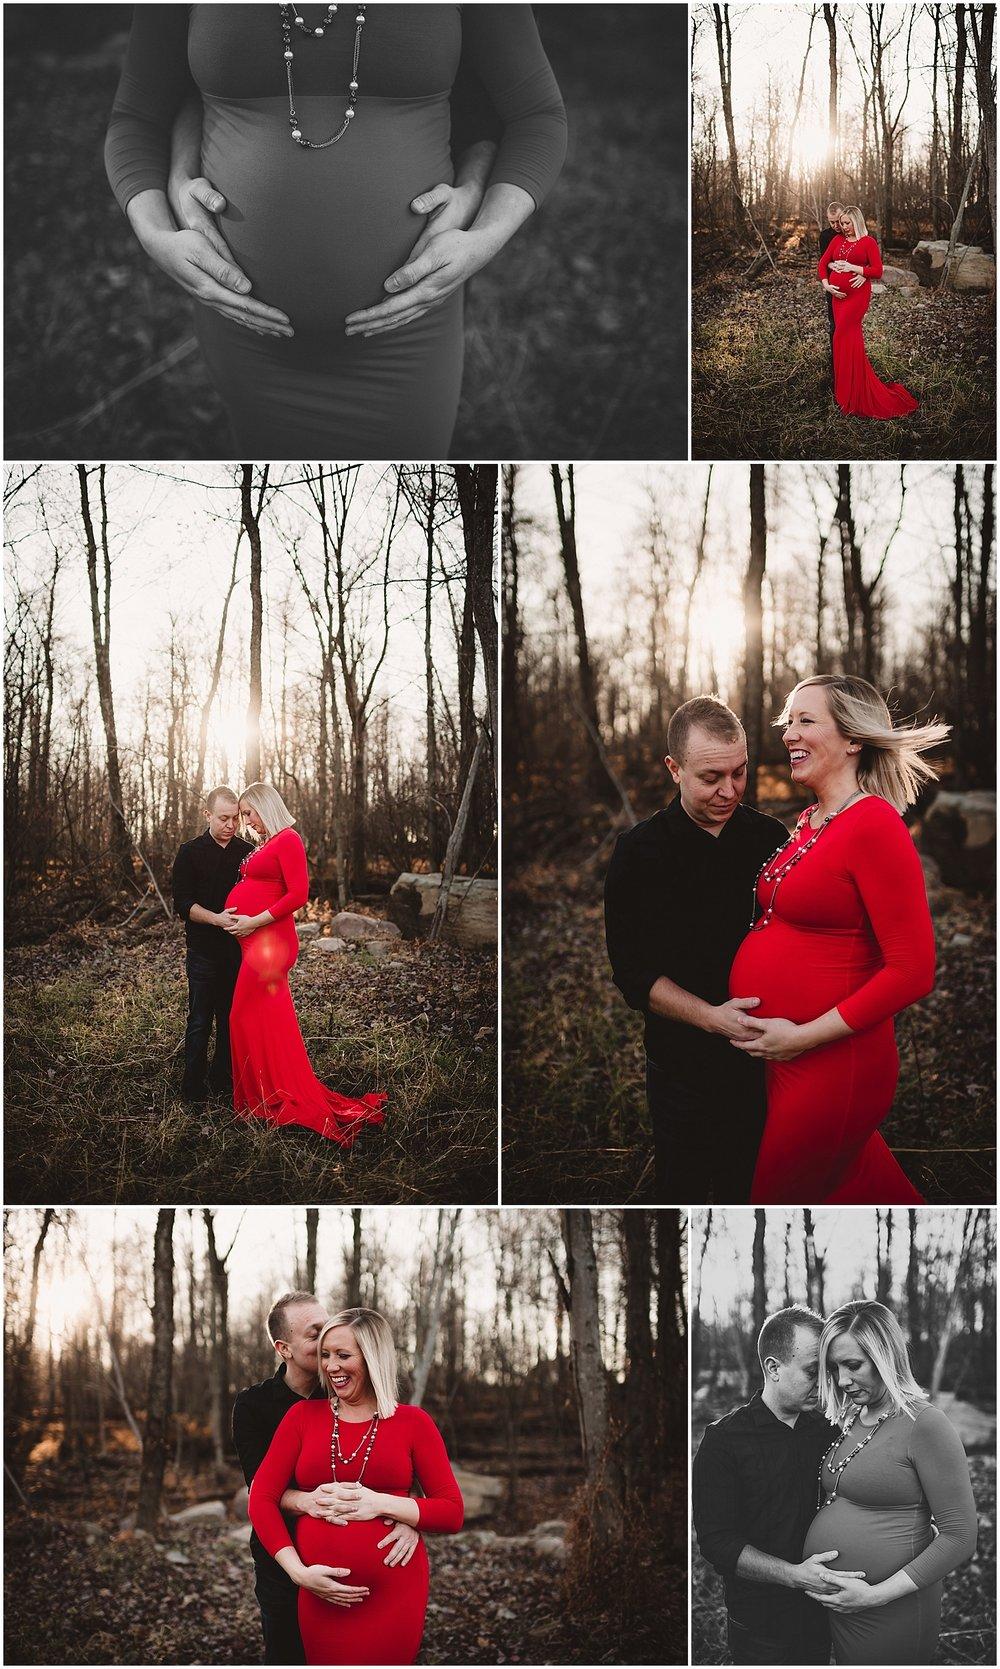 Maternity & Newborn photographer in NEPA & Central PA